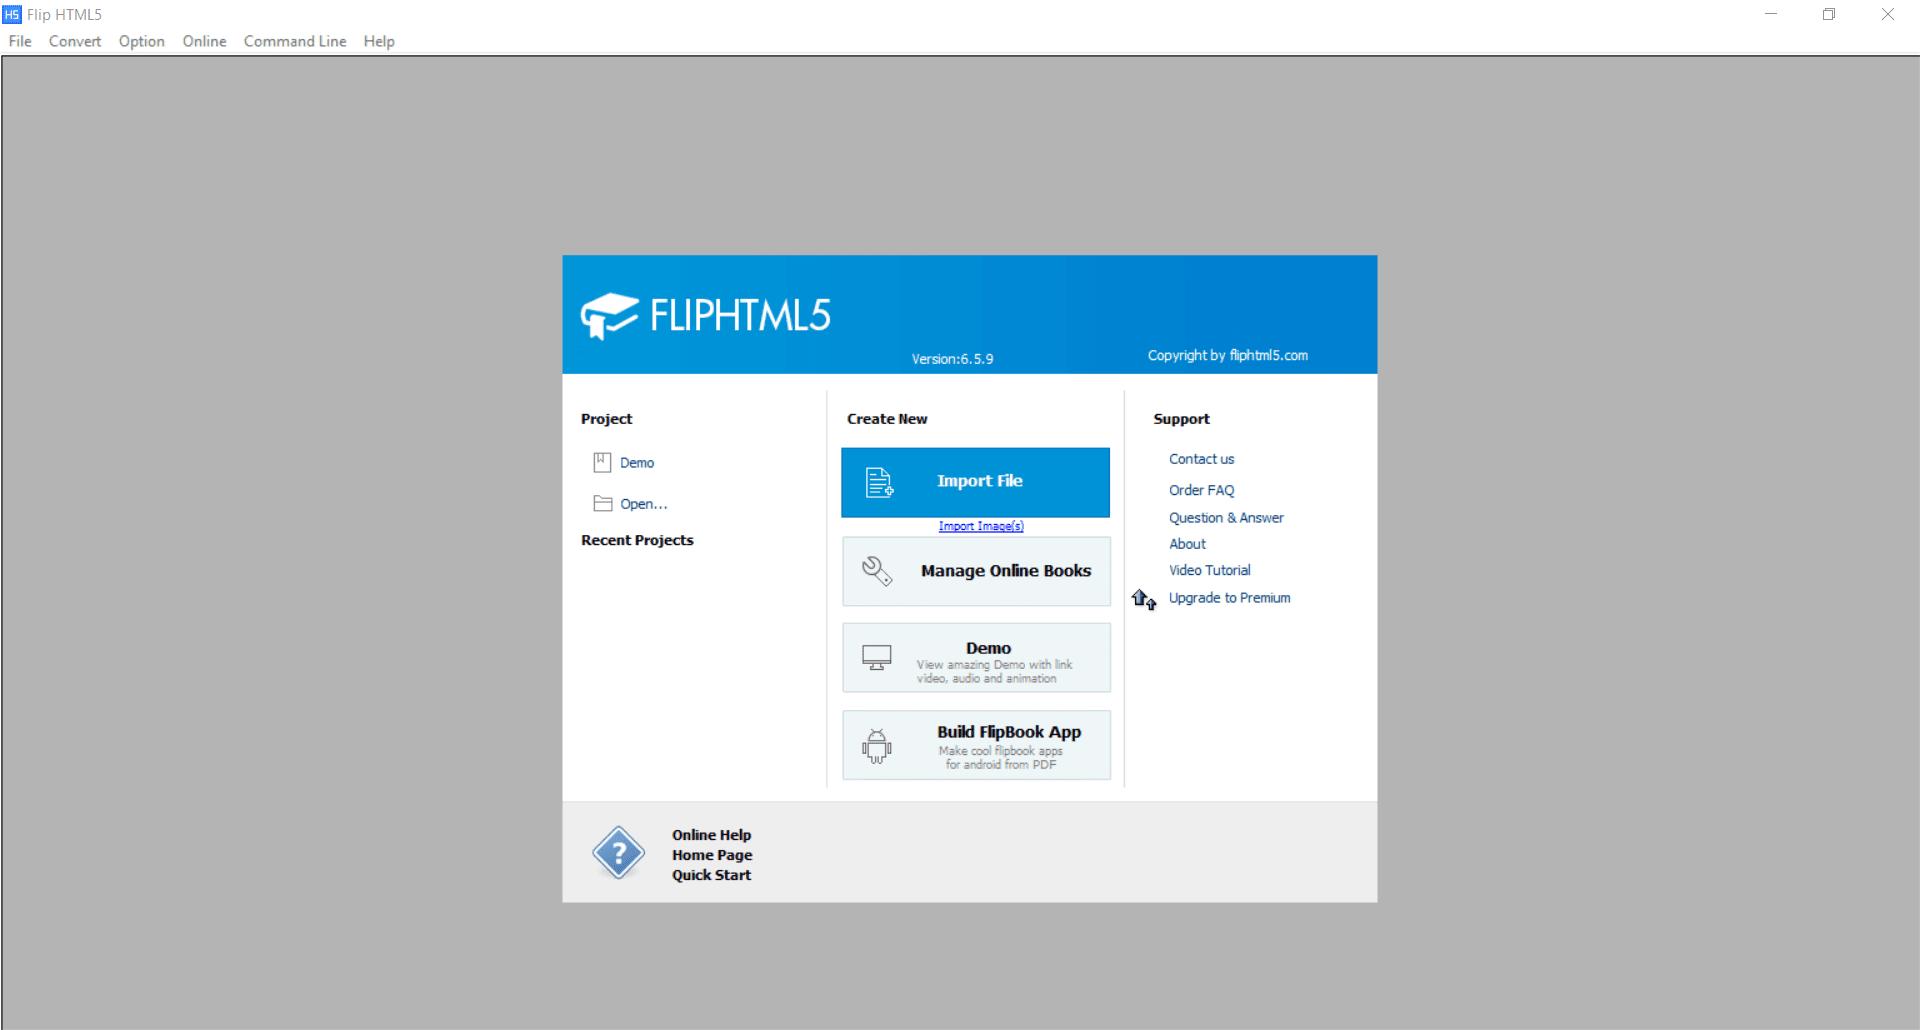 FlipHTML5 Main Interface Screenshot